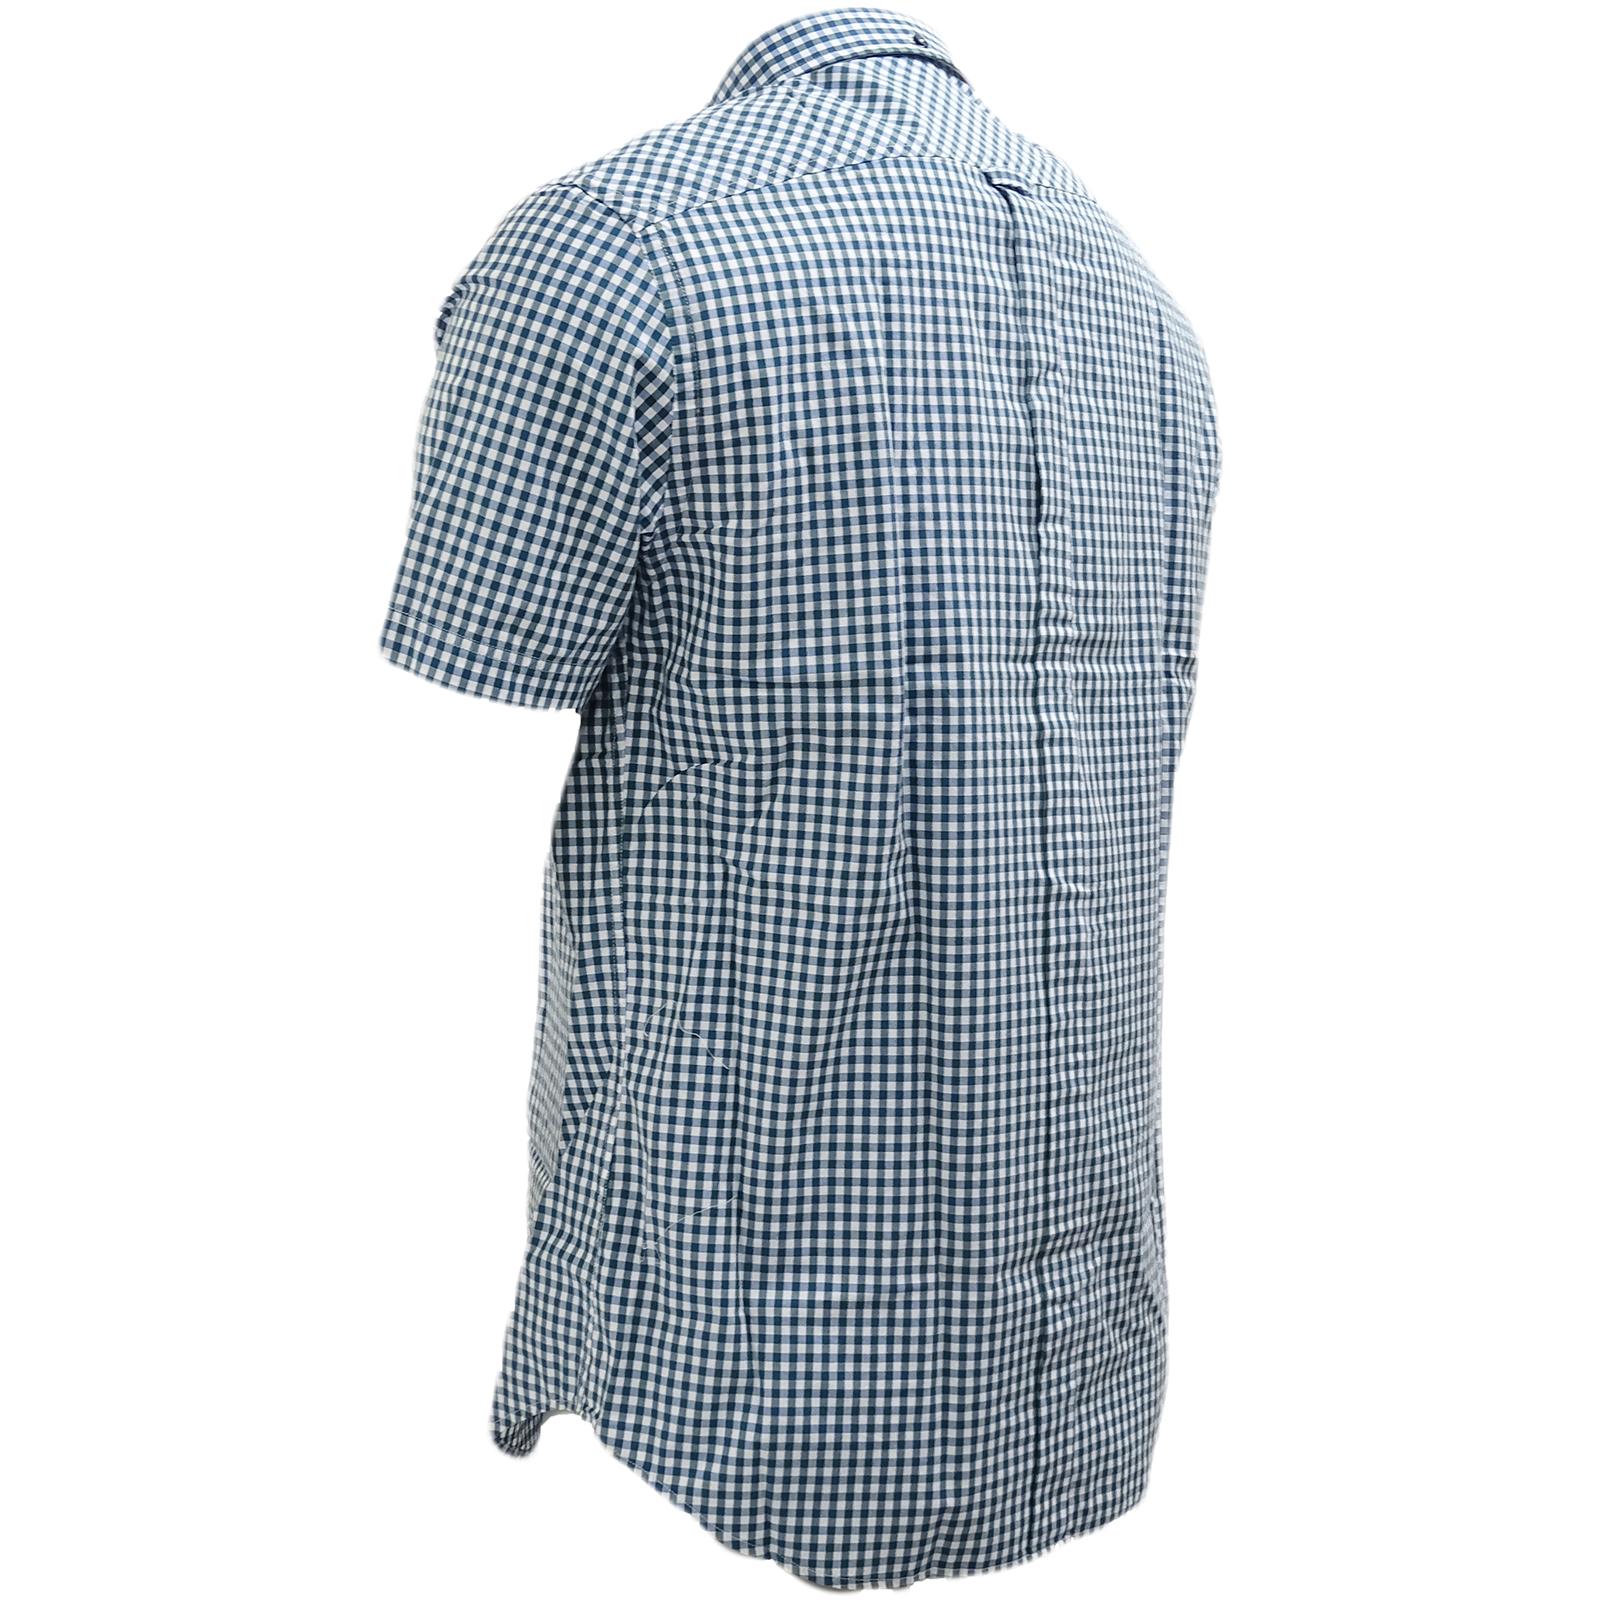 Ben Sherman Camicia Button Down Gingham Check 47949